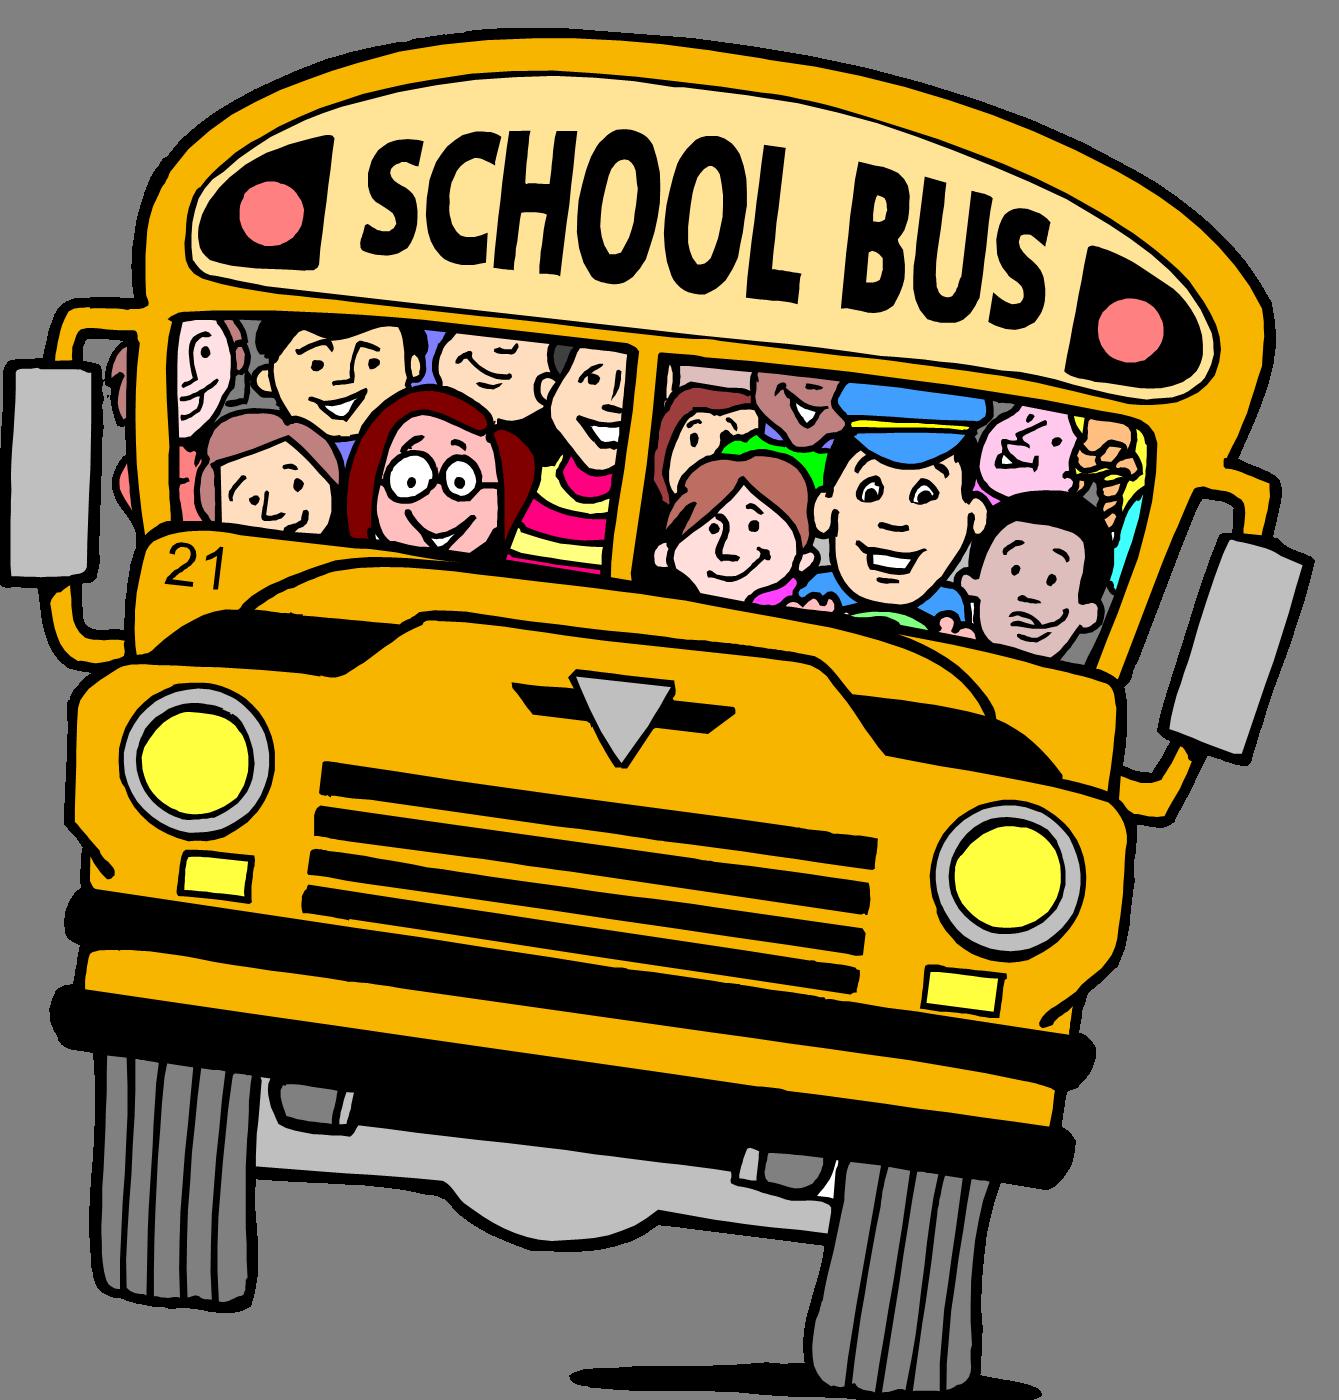 Raffle clipart bus ticket. School public transport service